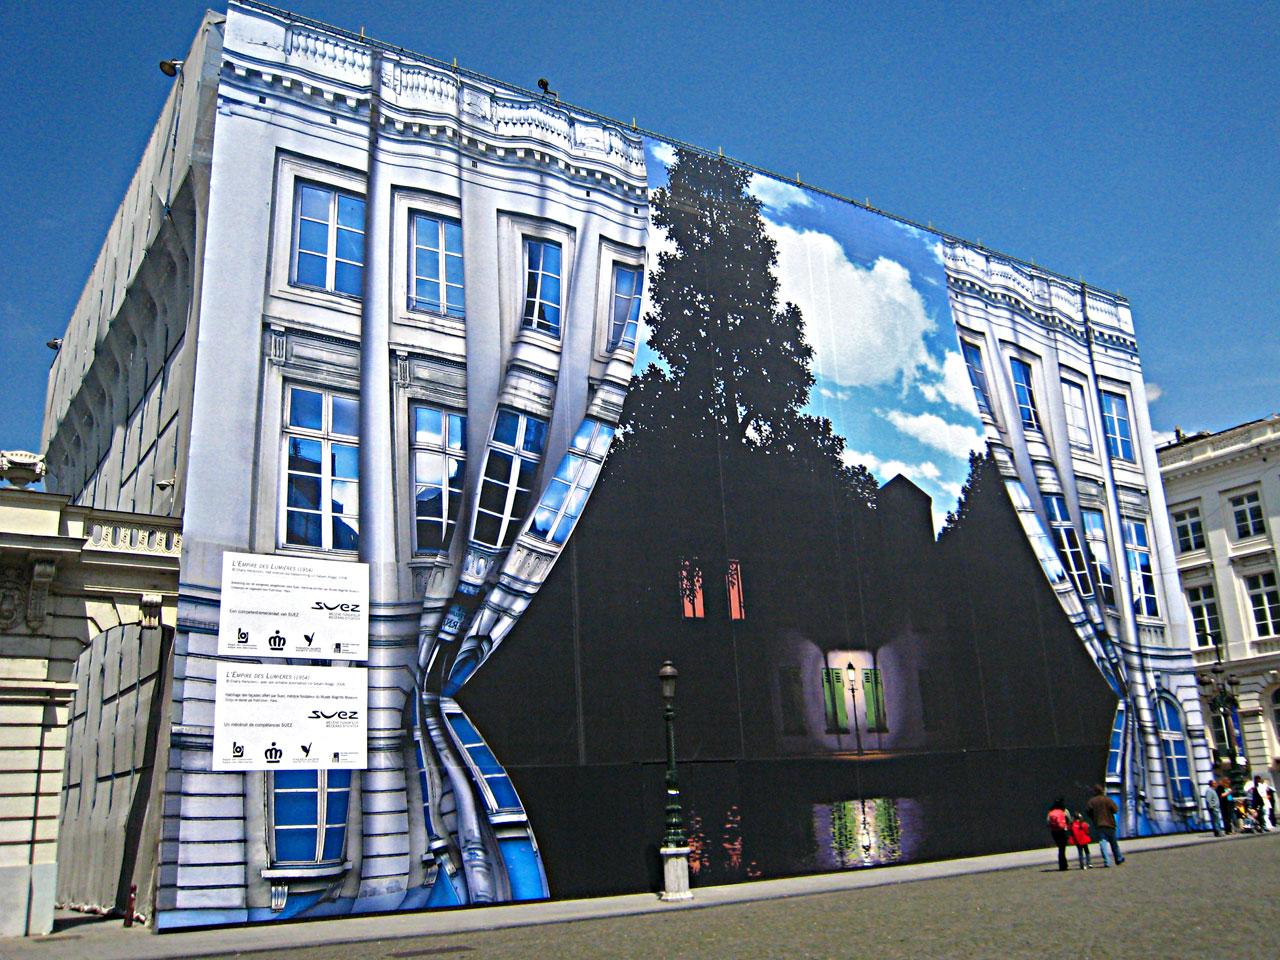 Magritte Wallpapers C a r W a l l p a p e r 2014 1280x960